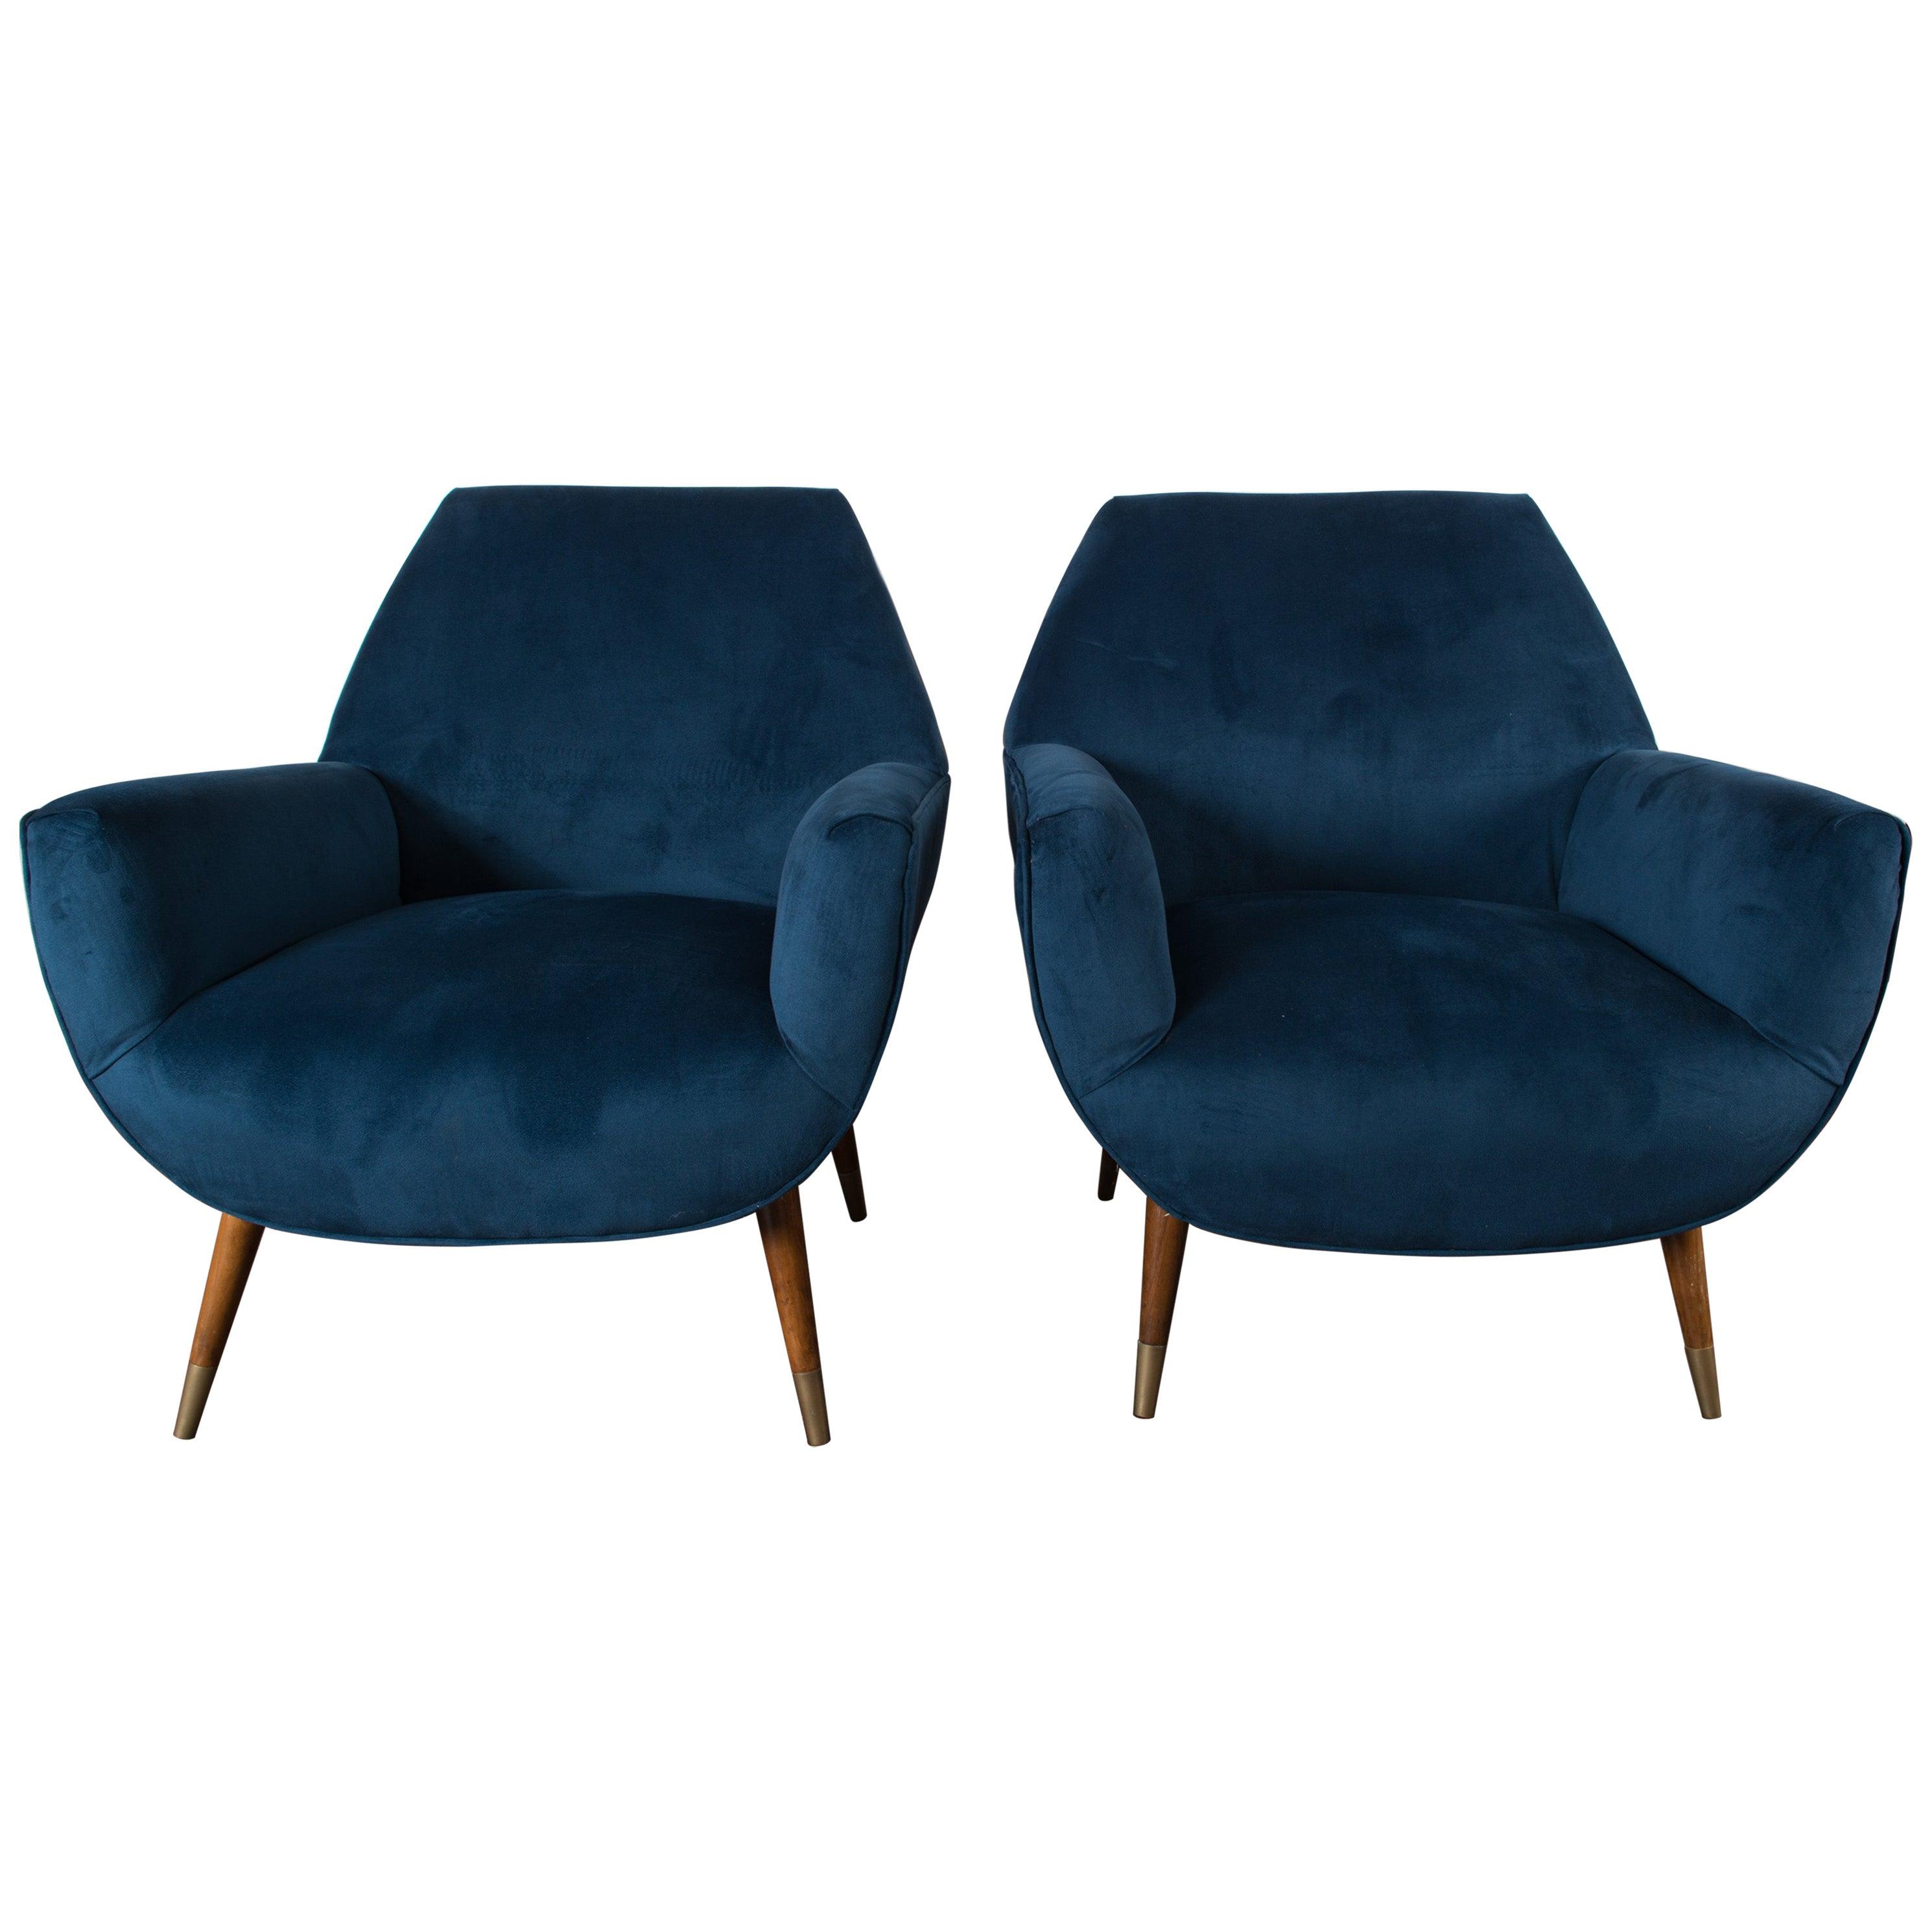 Pair of Italian Blue Velvet Mid-Century Modern Lounge Chairs